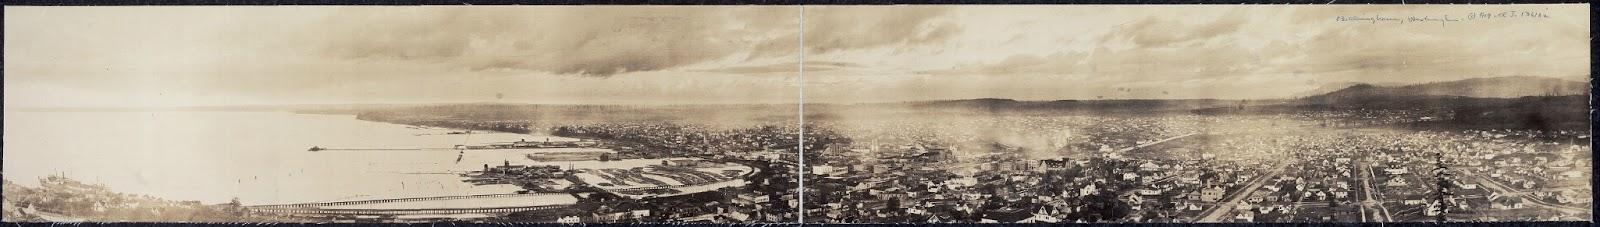 Bellingham_1909 2050.jpg